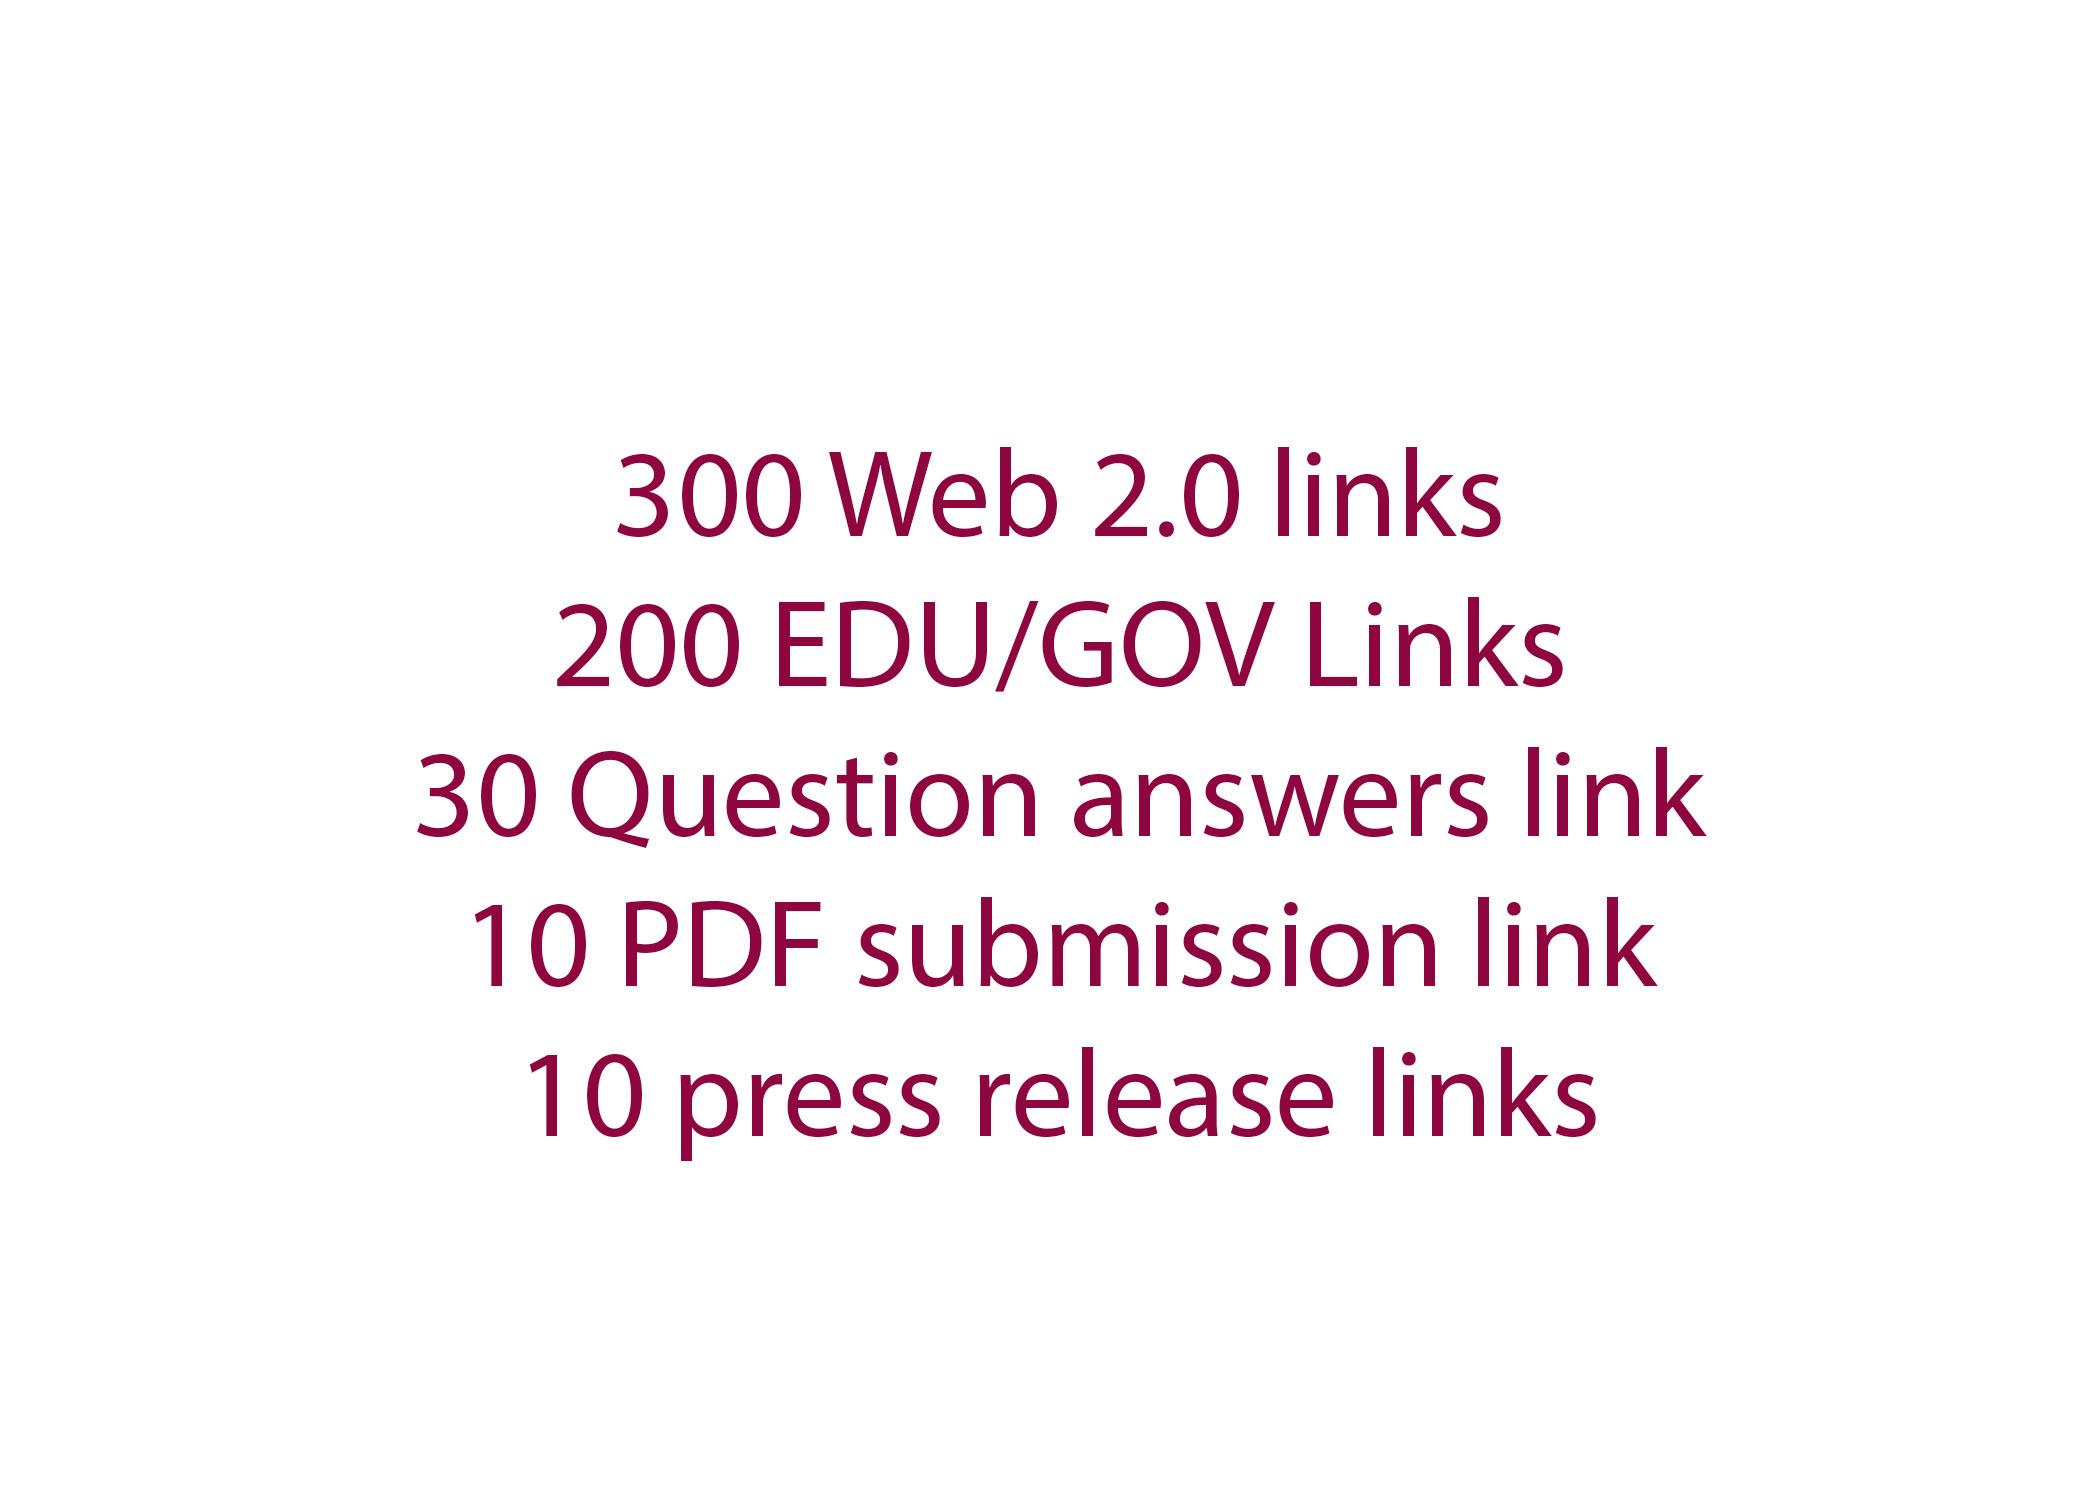 300 Web 2.0 + 200 EDU/GOV + 30 question answer + 10 PDF + 10 press release